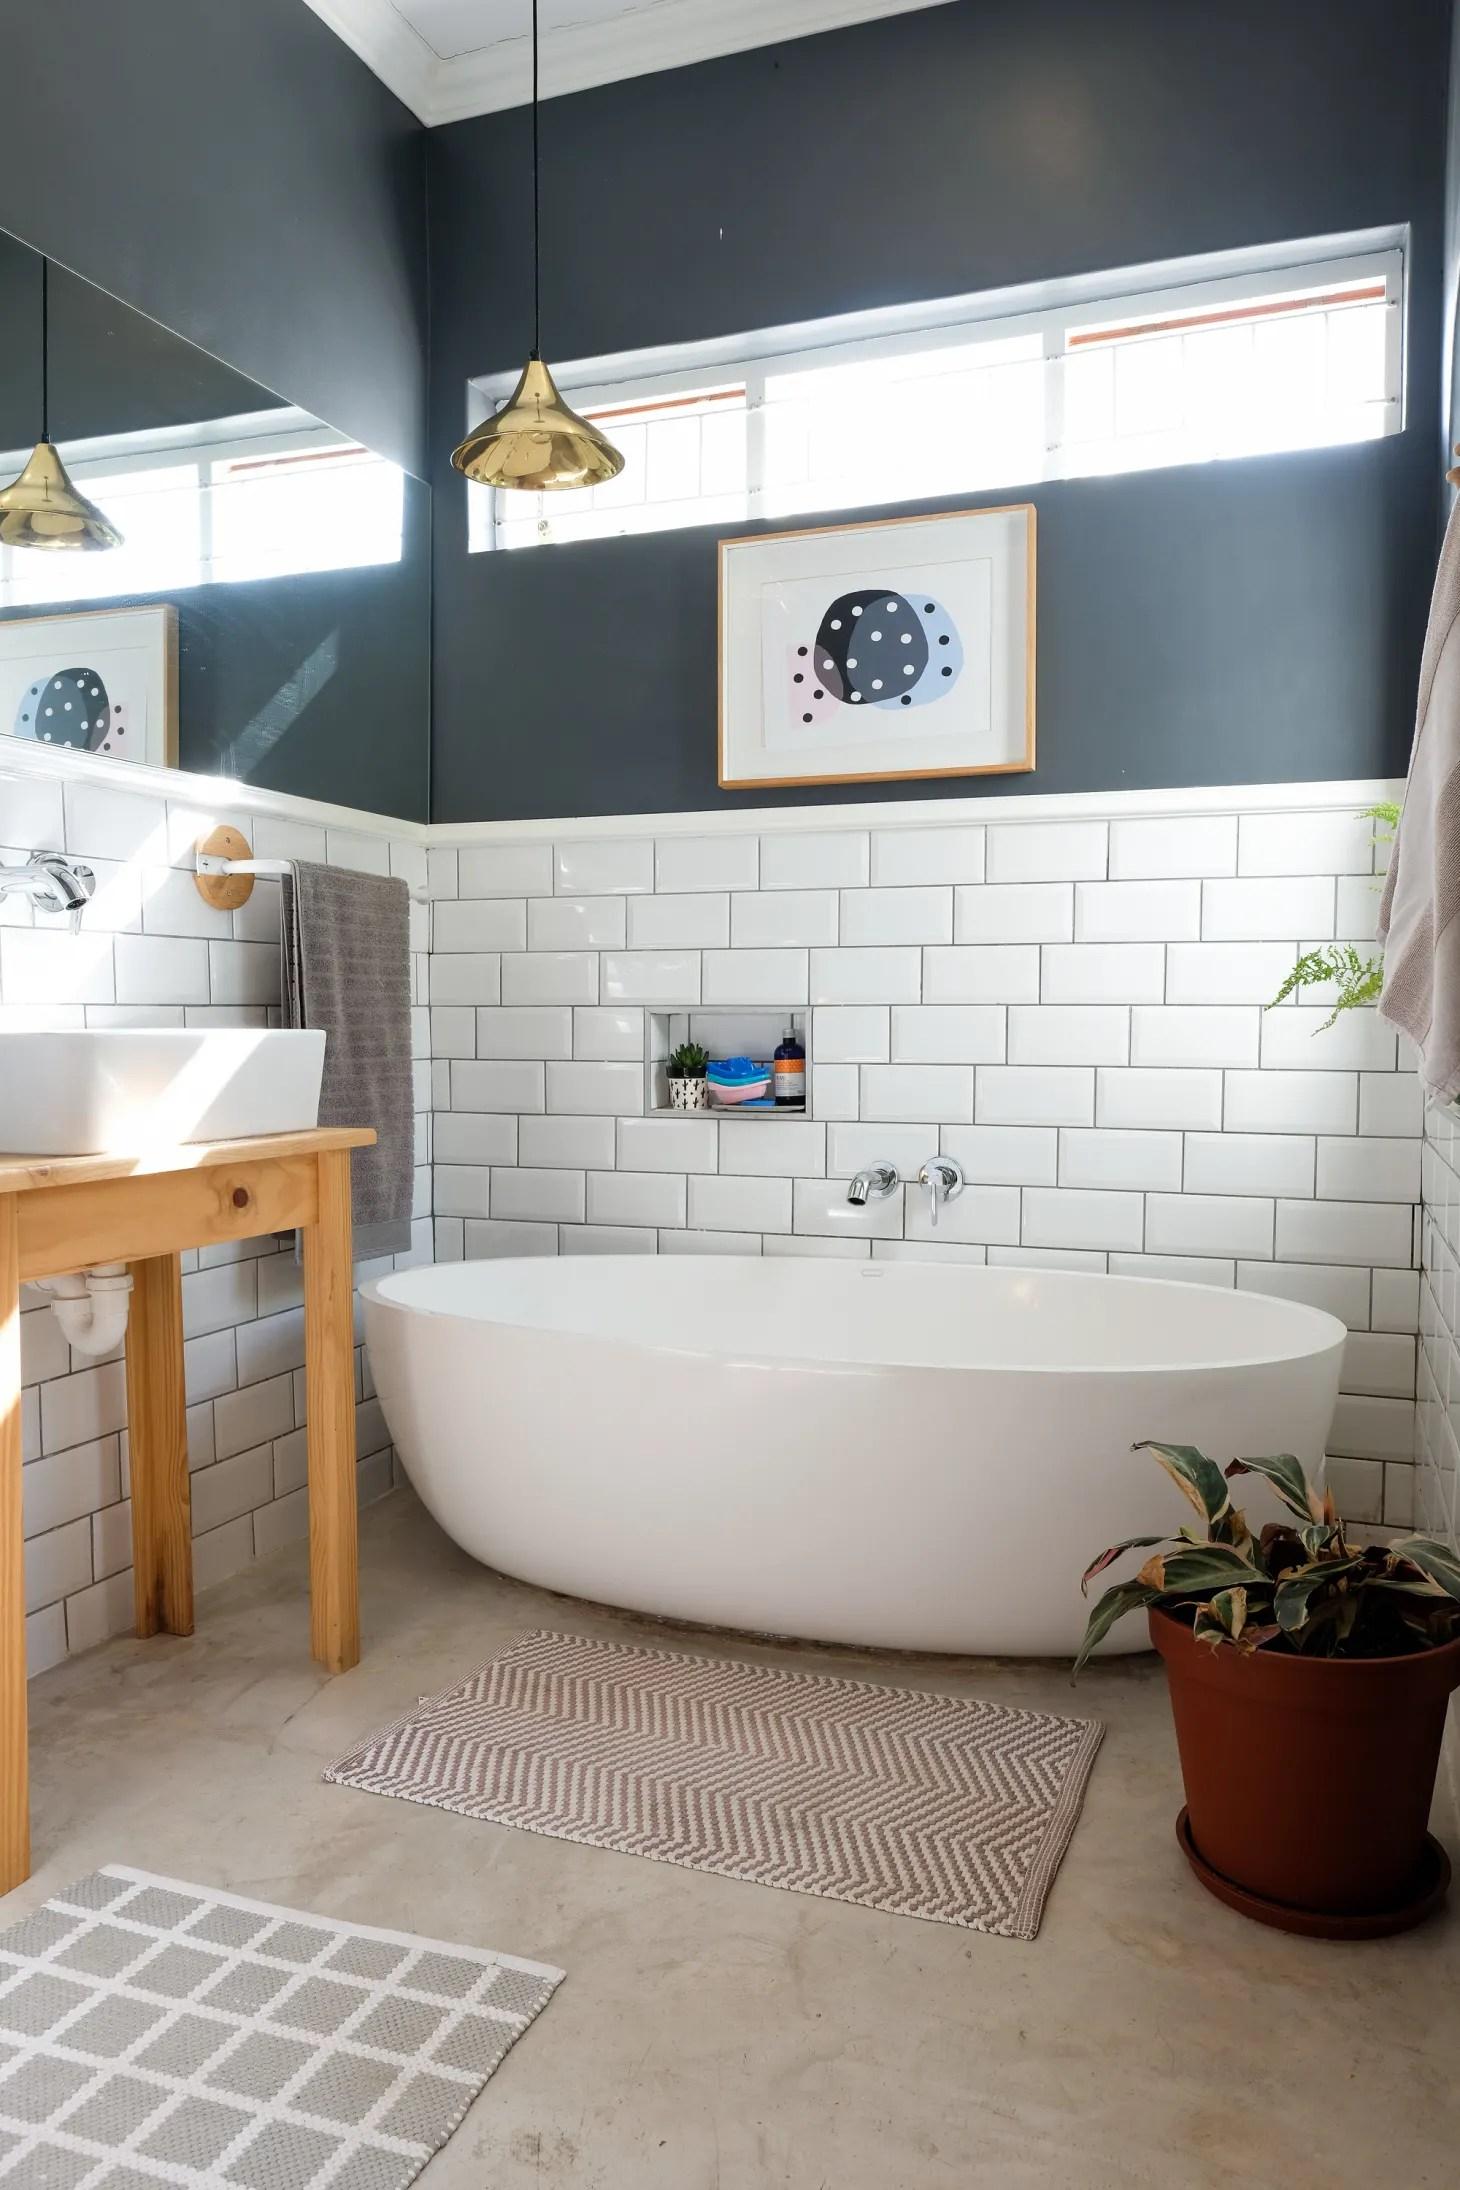 25 Small Bathroom Storage & Design Ideas - Storage ... on Small Apartment Bathroom Storage Ideas  id=50867